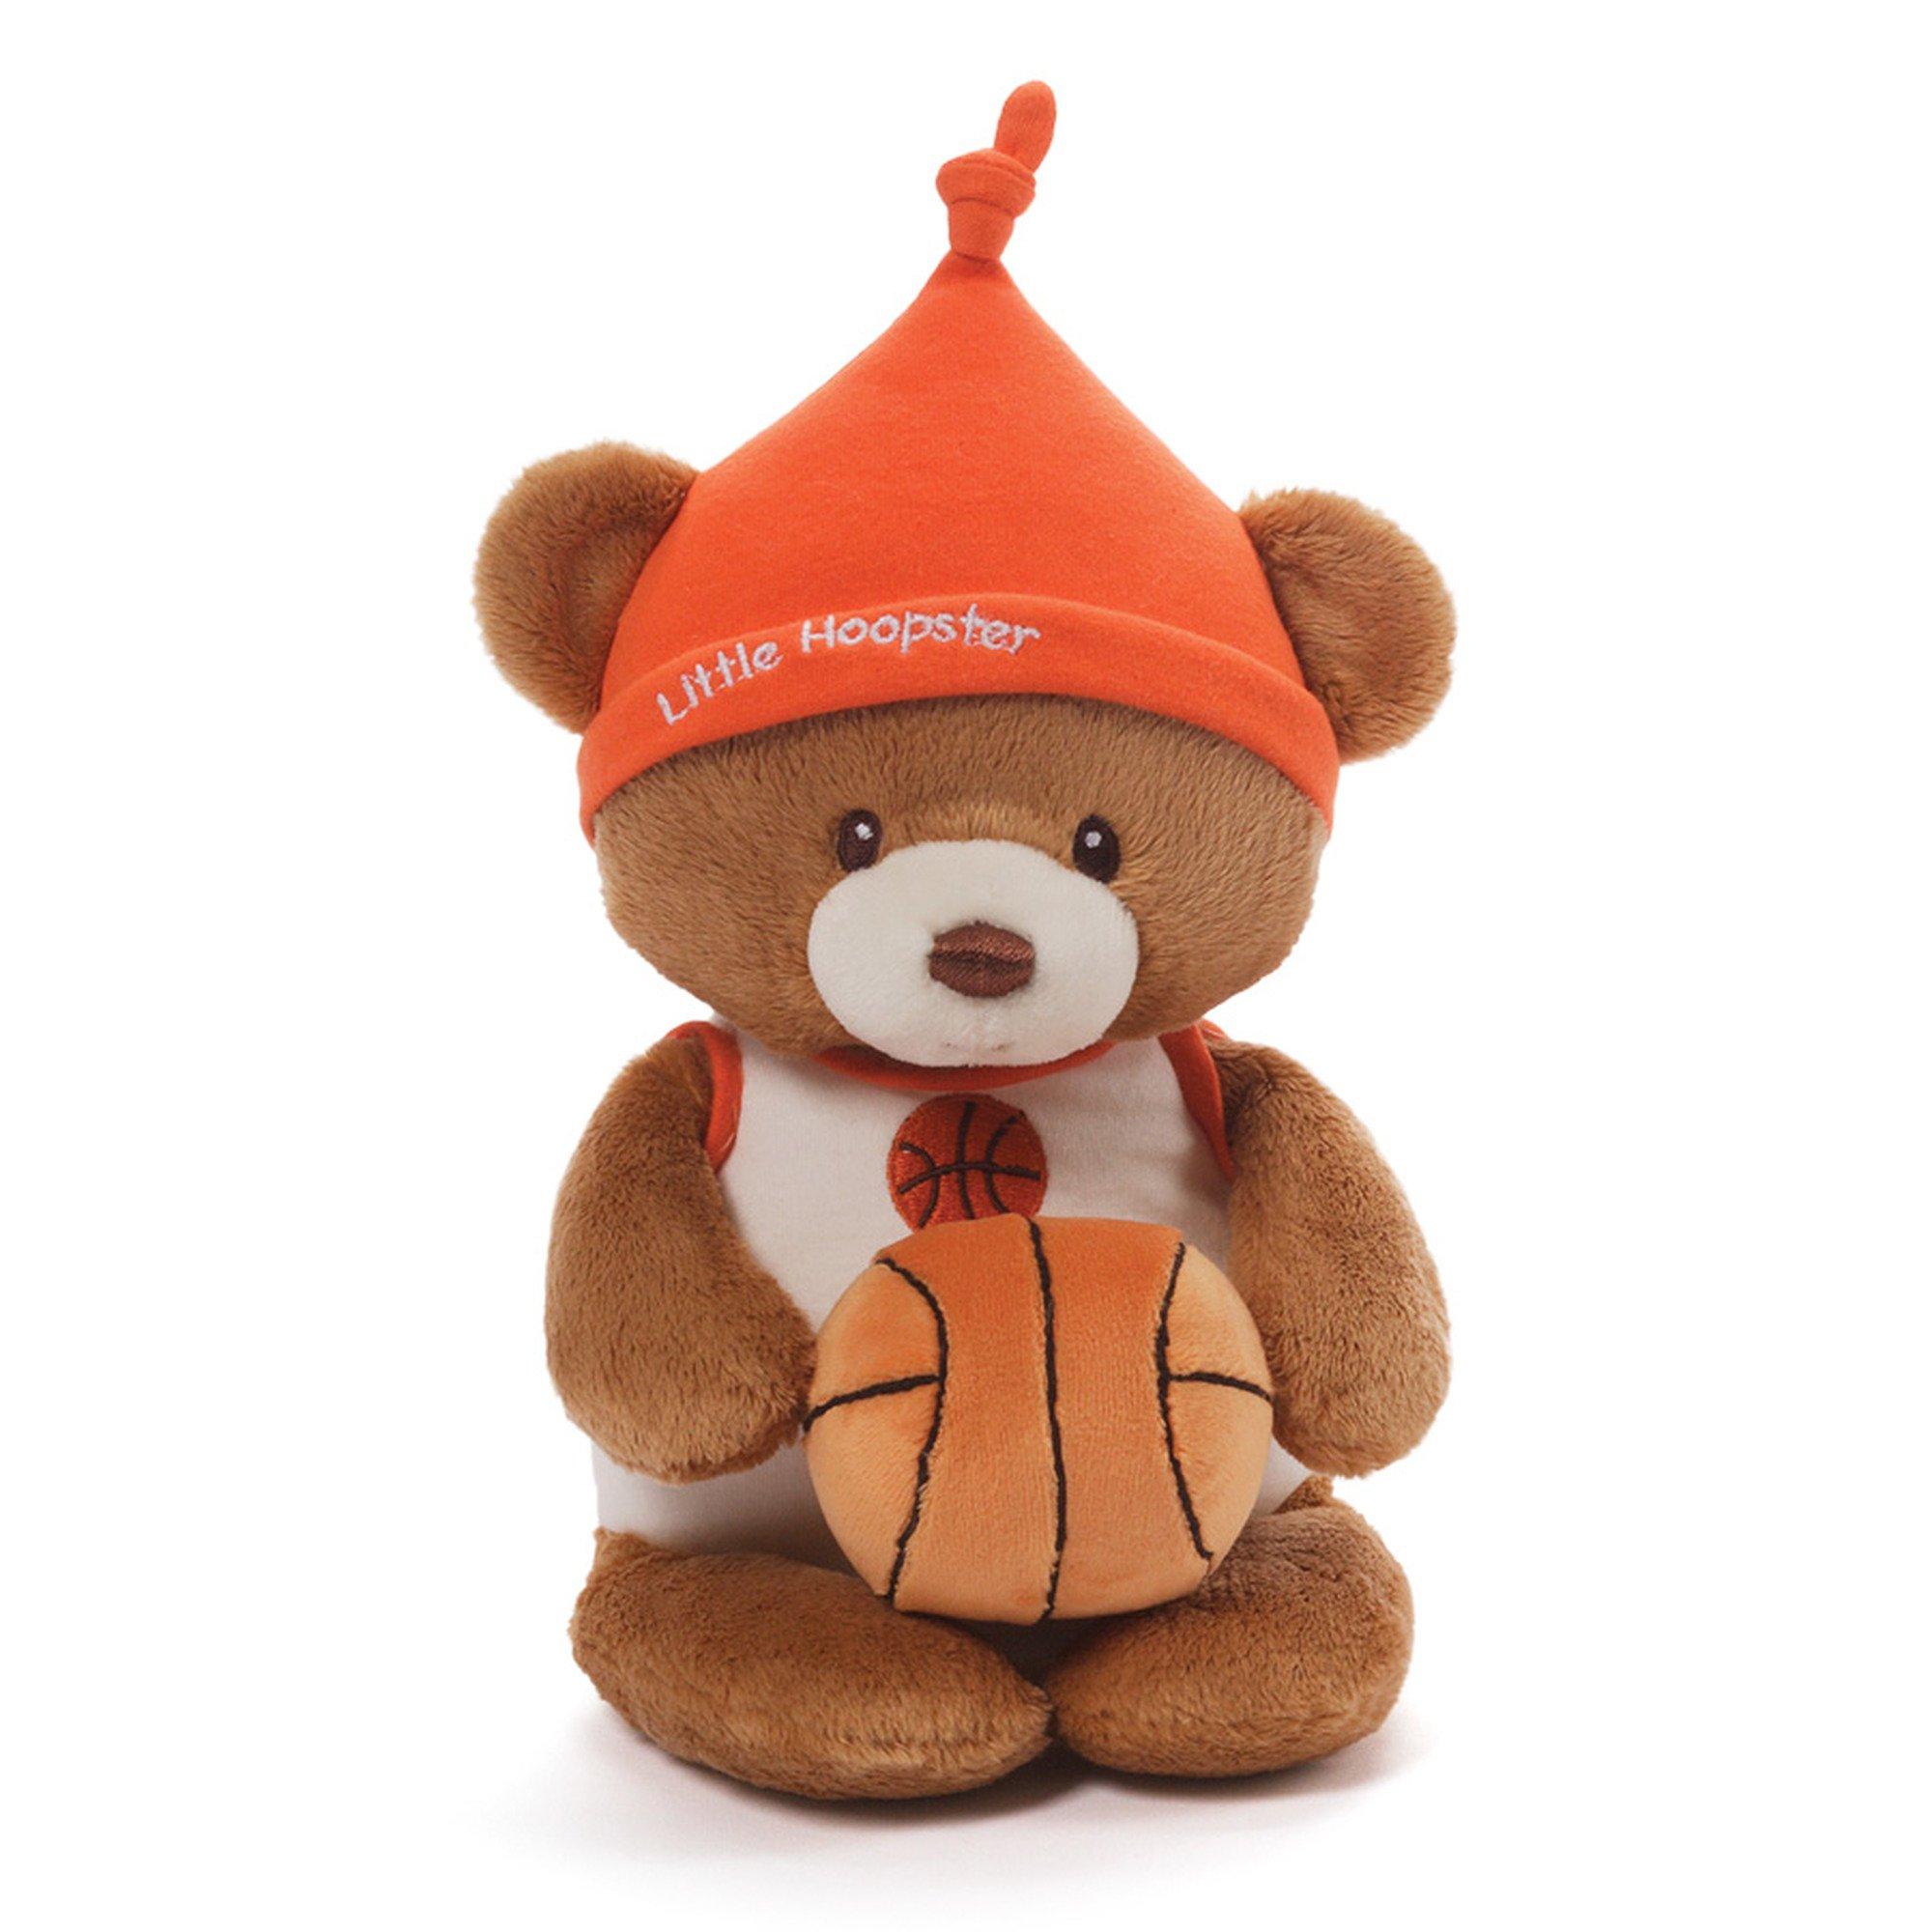 Gund Baby Teddy Bear and Rattle, Little Hoopster Basketball